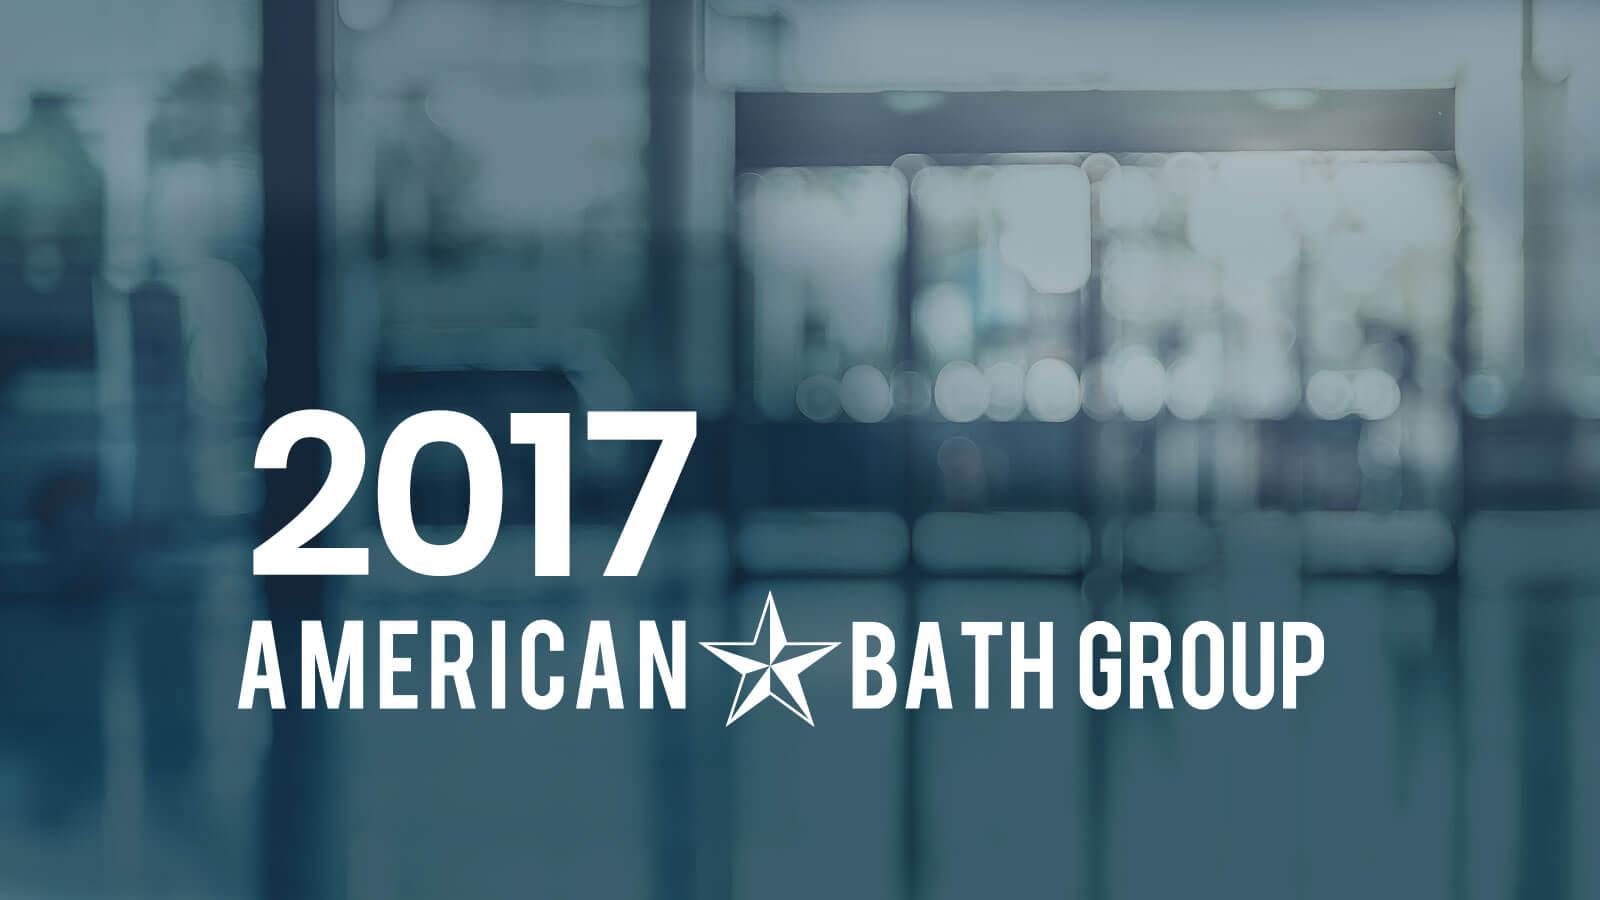 2017: American Bath Group